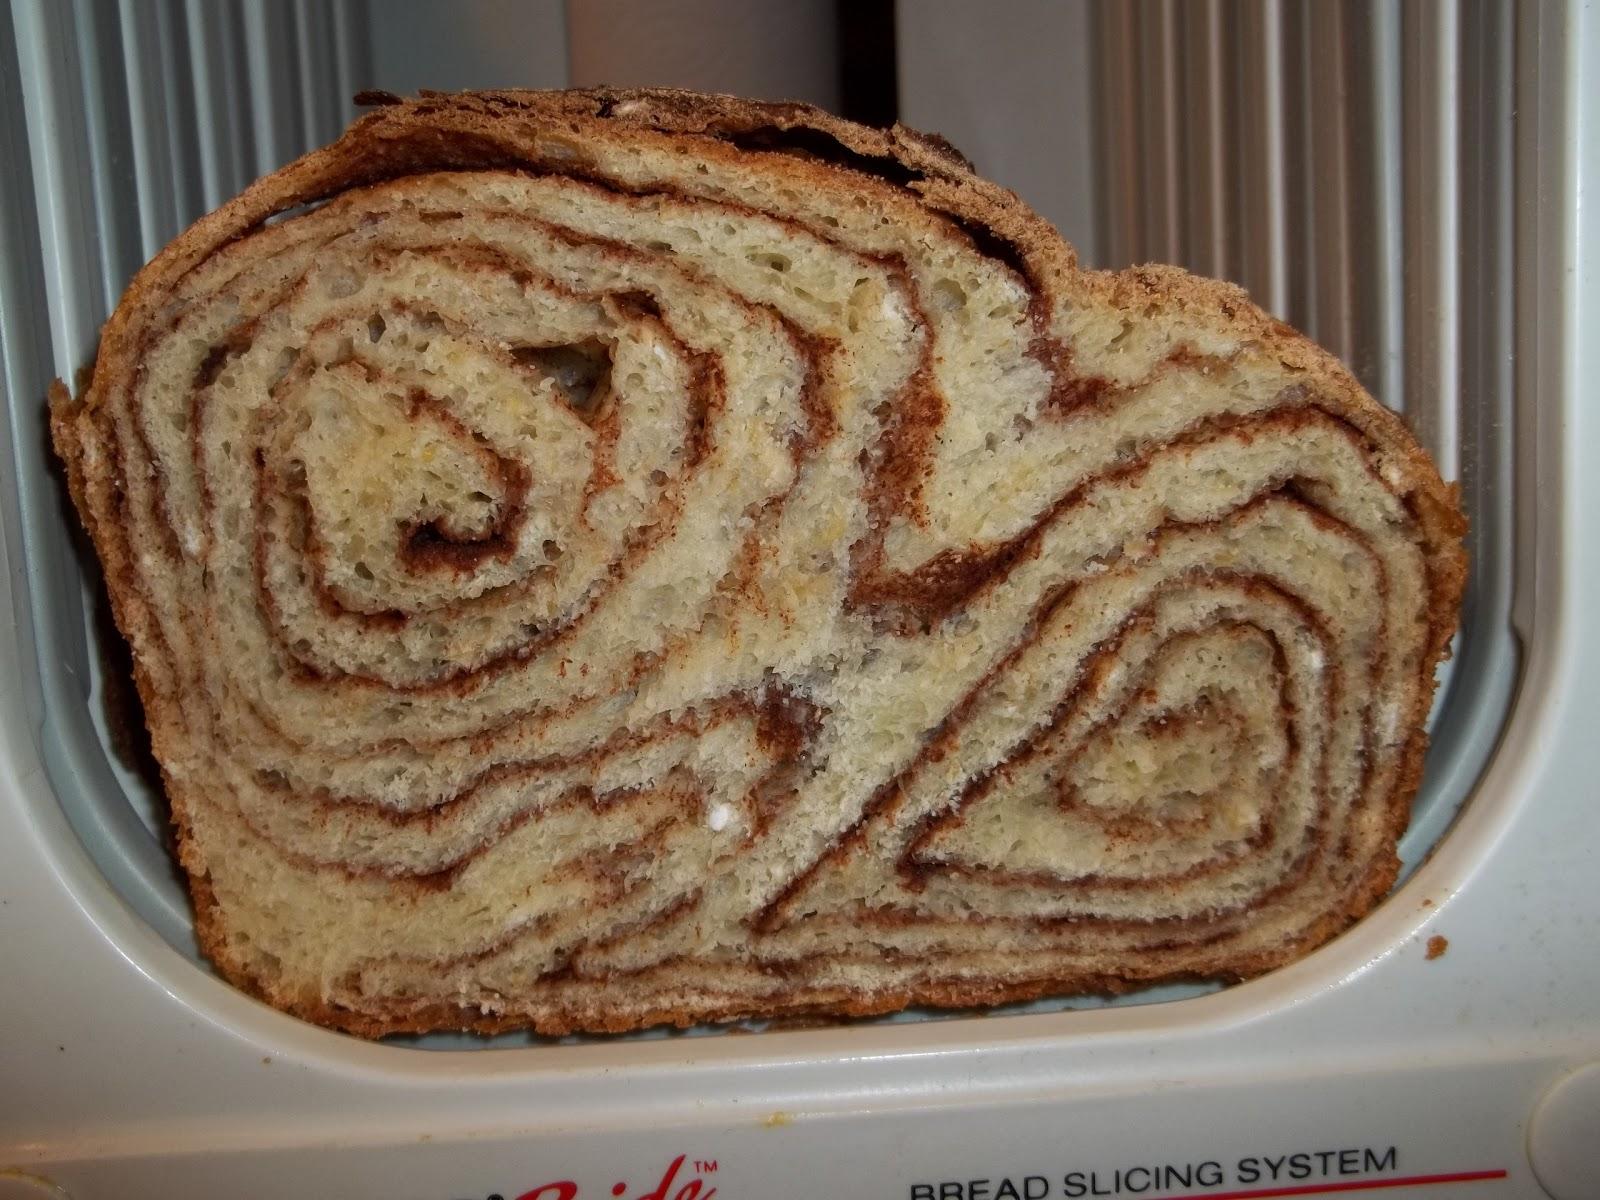 Household How To: Cinnamon Swirl Bread